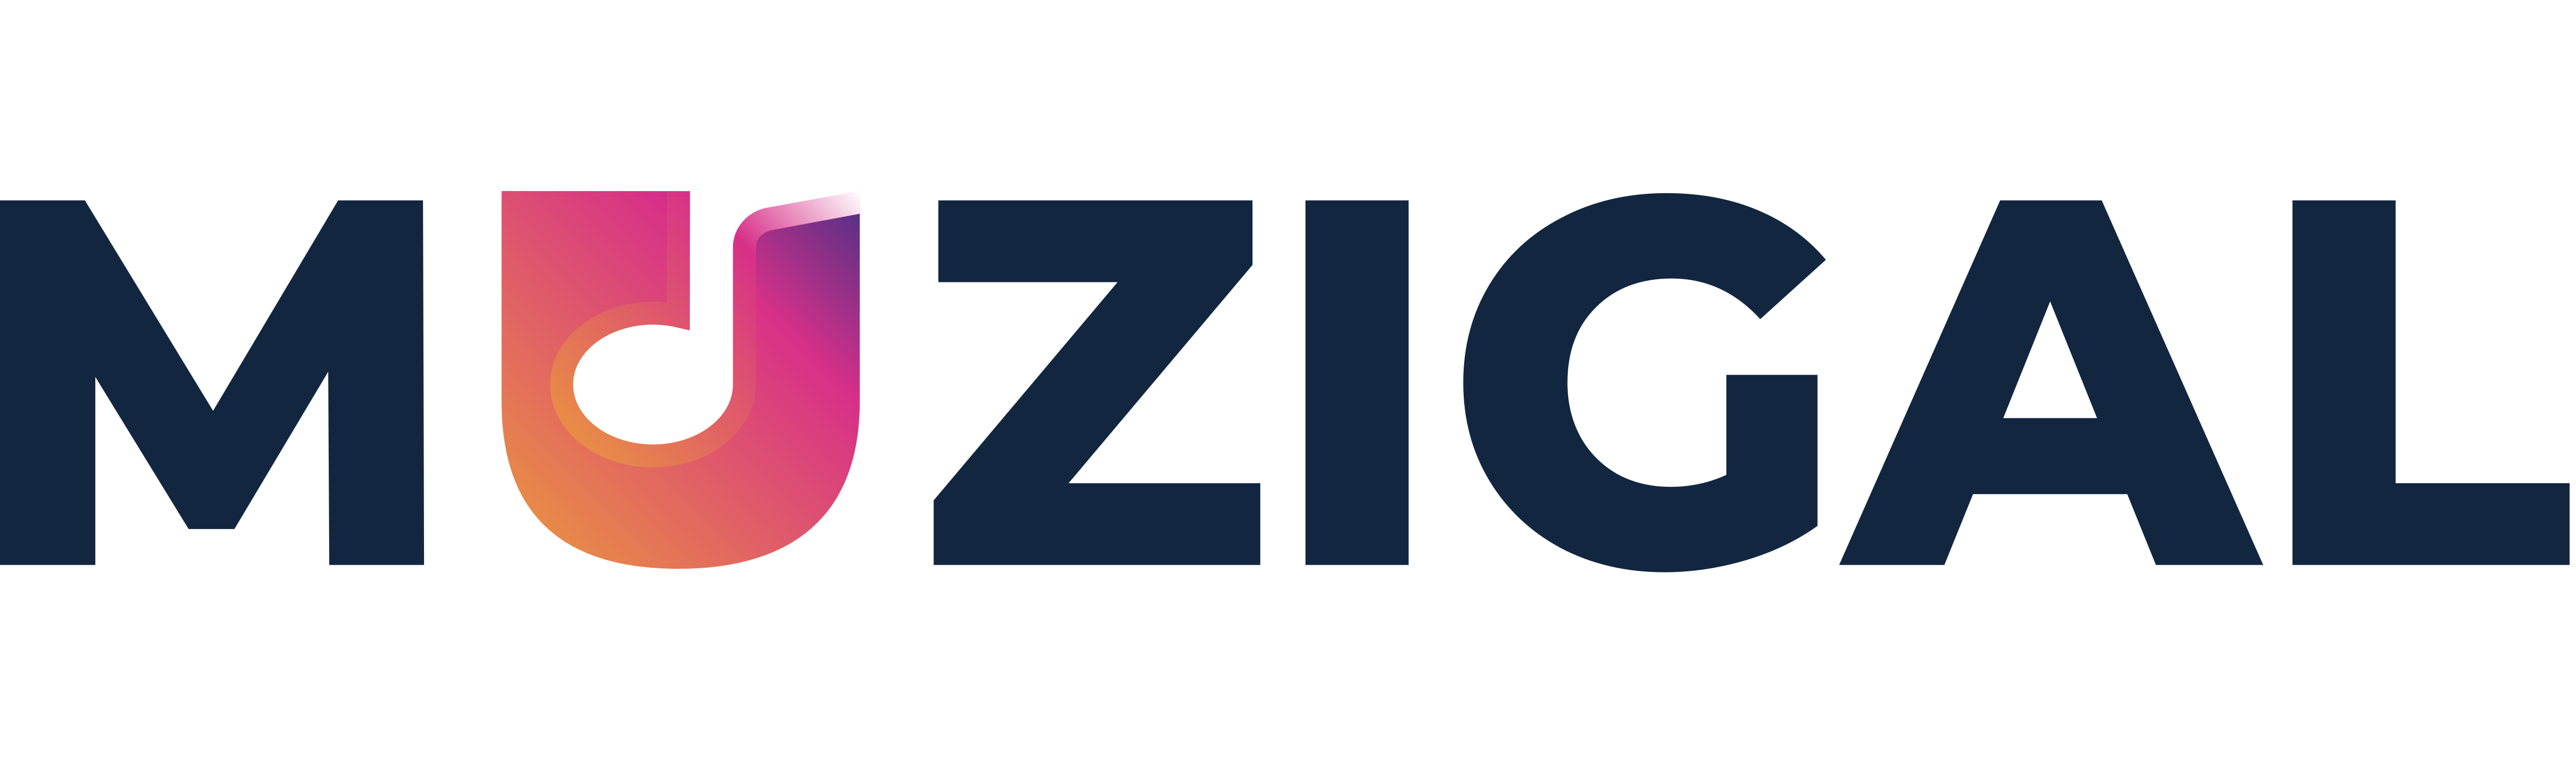 Muzigal Brand Launch Campaign